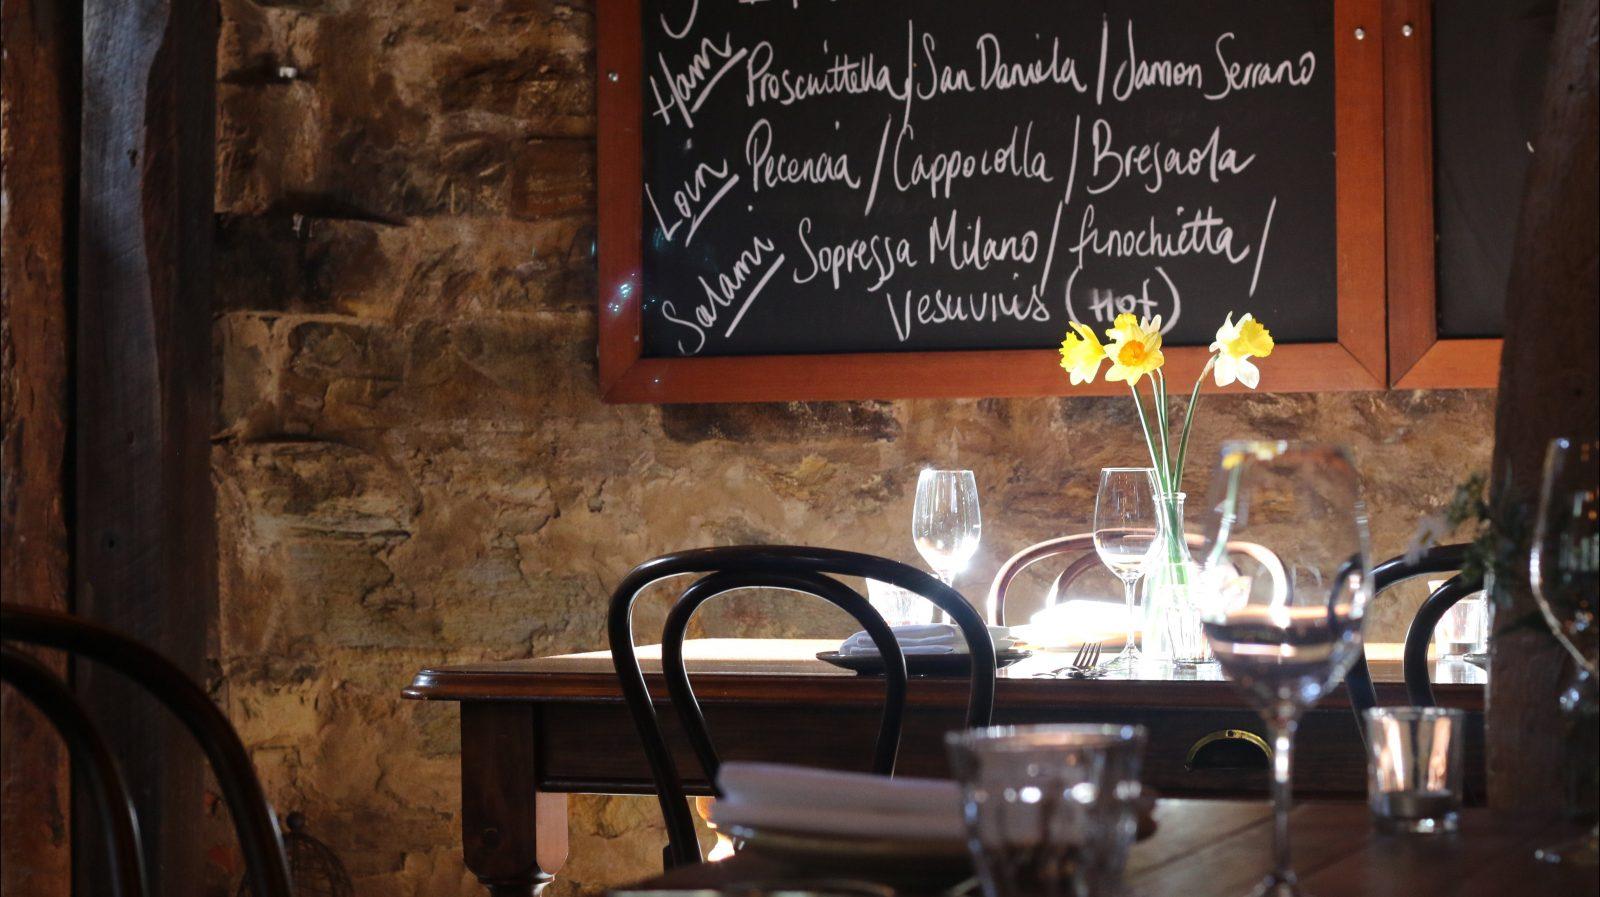 old stone walls, elegant dining table, blackboard menu of cured Italian meats. sunlight & daffodils